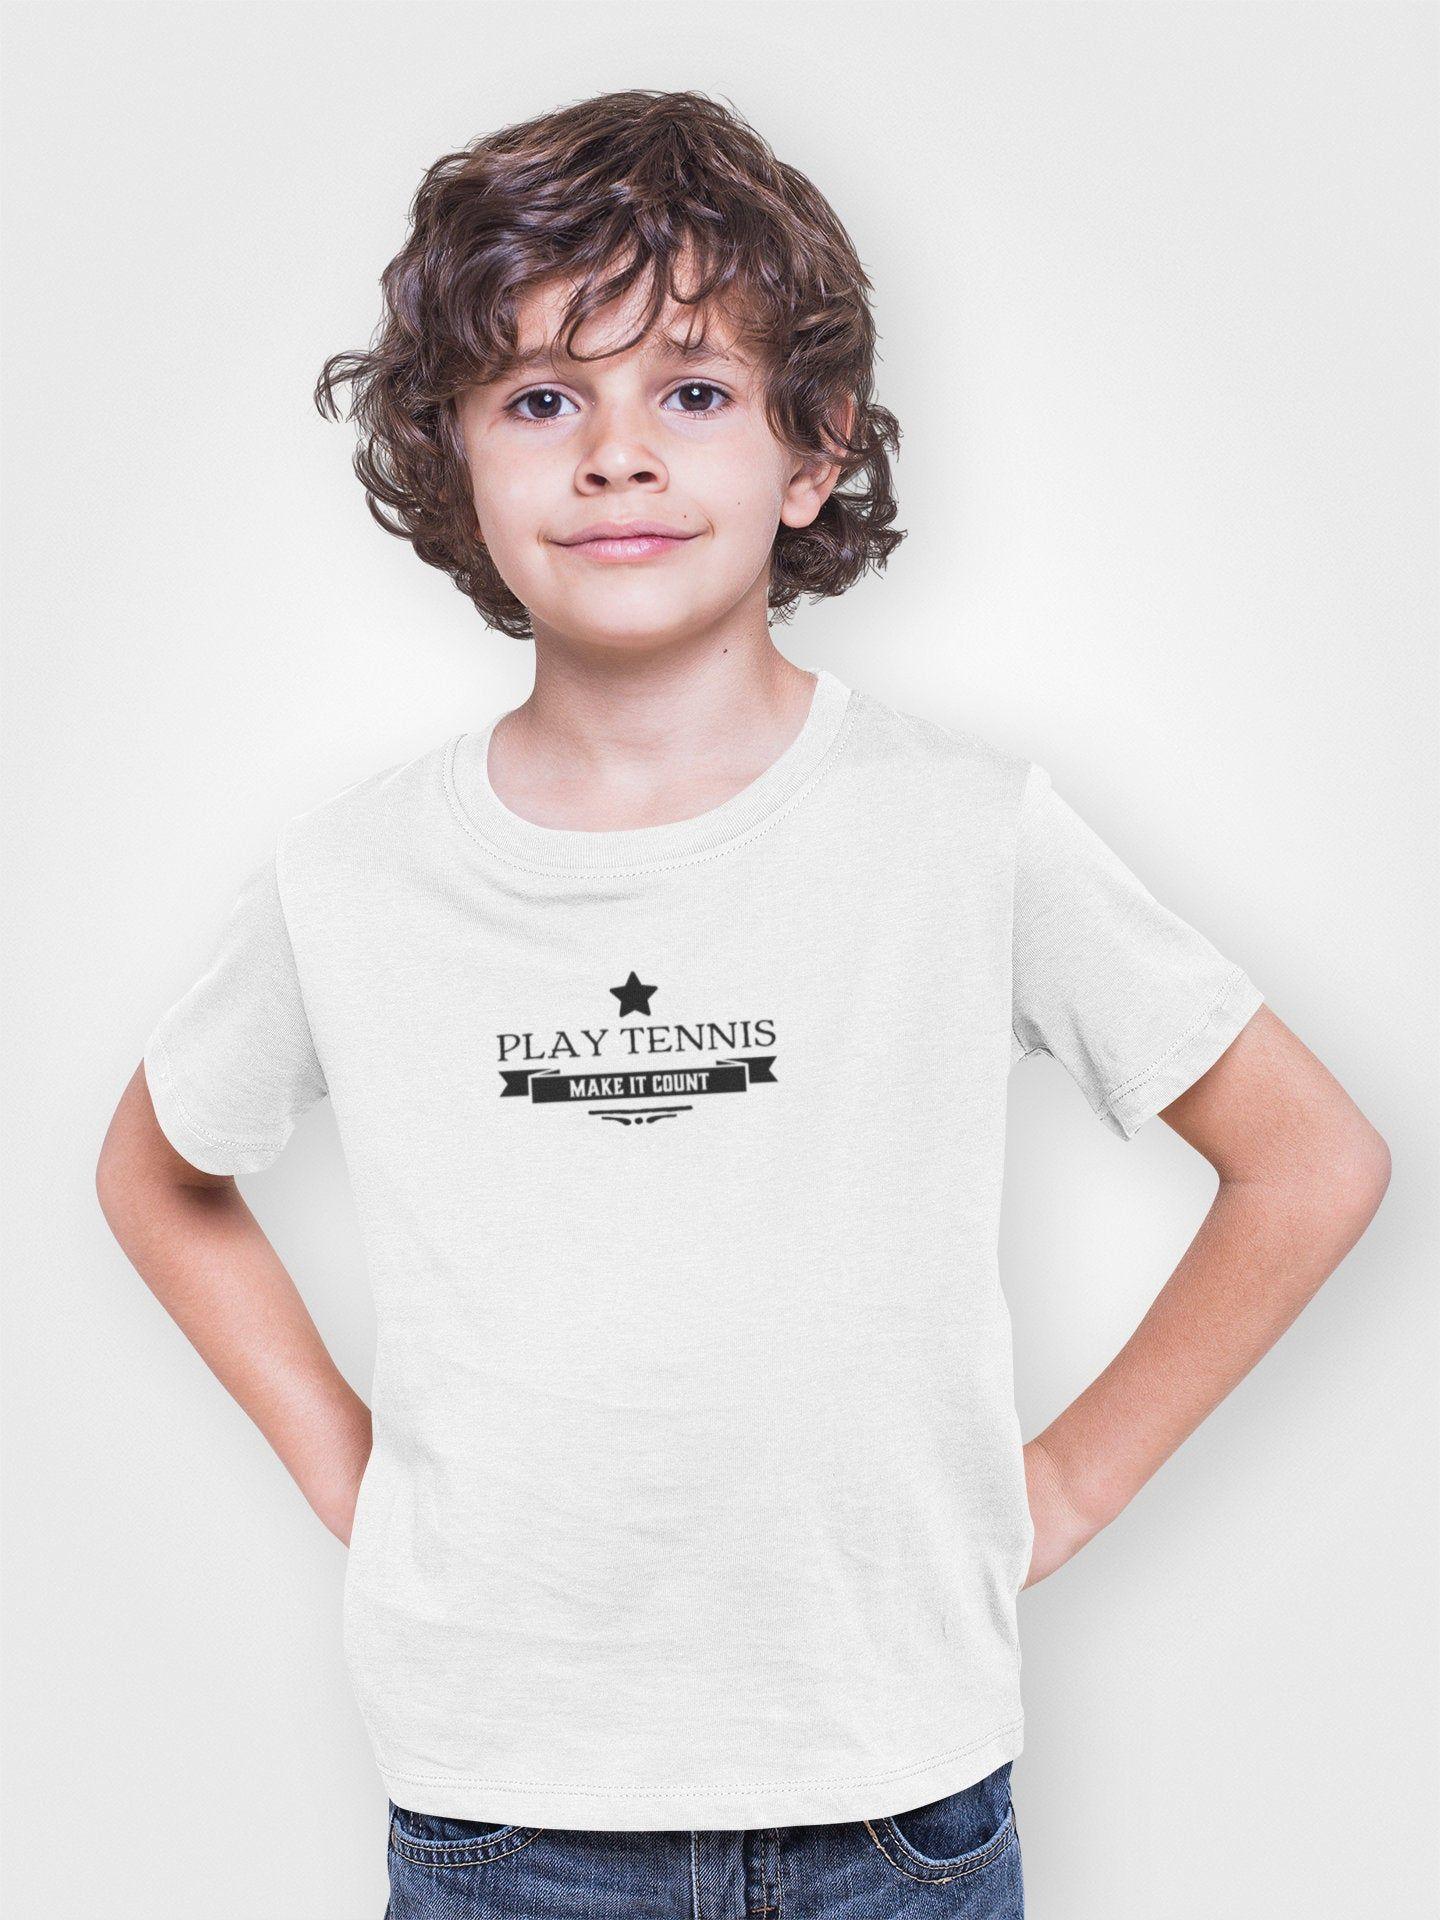 Children Tennis Tshirts Kids Regular Fit Tee Kids Shirt